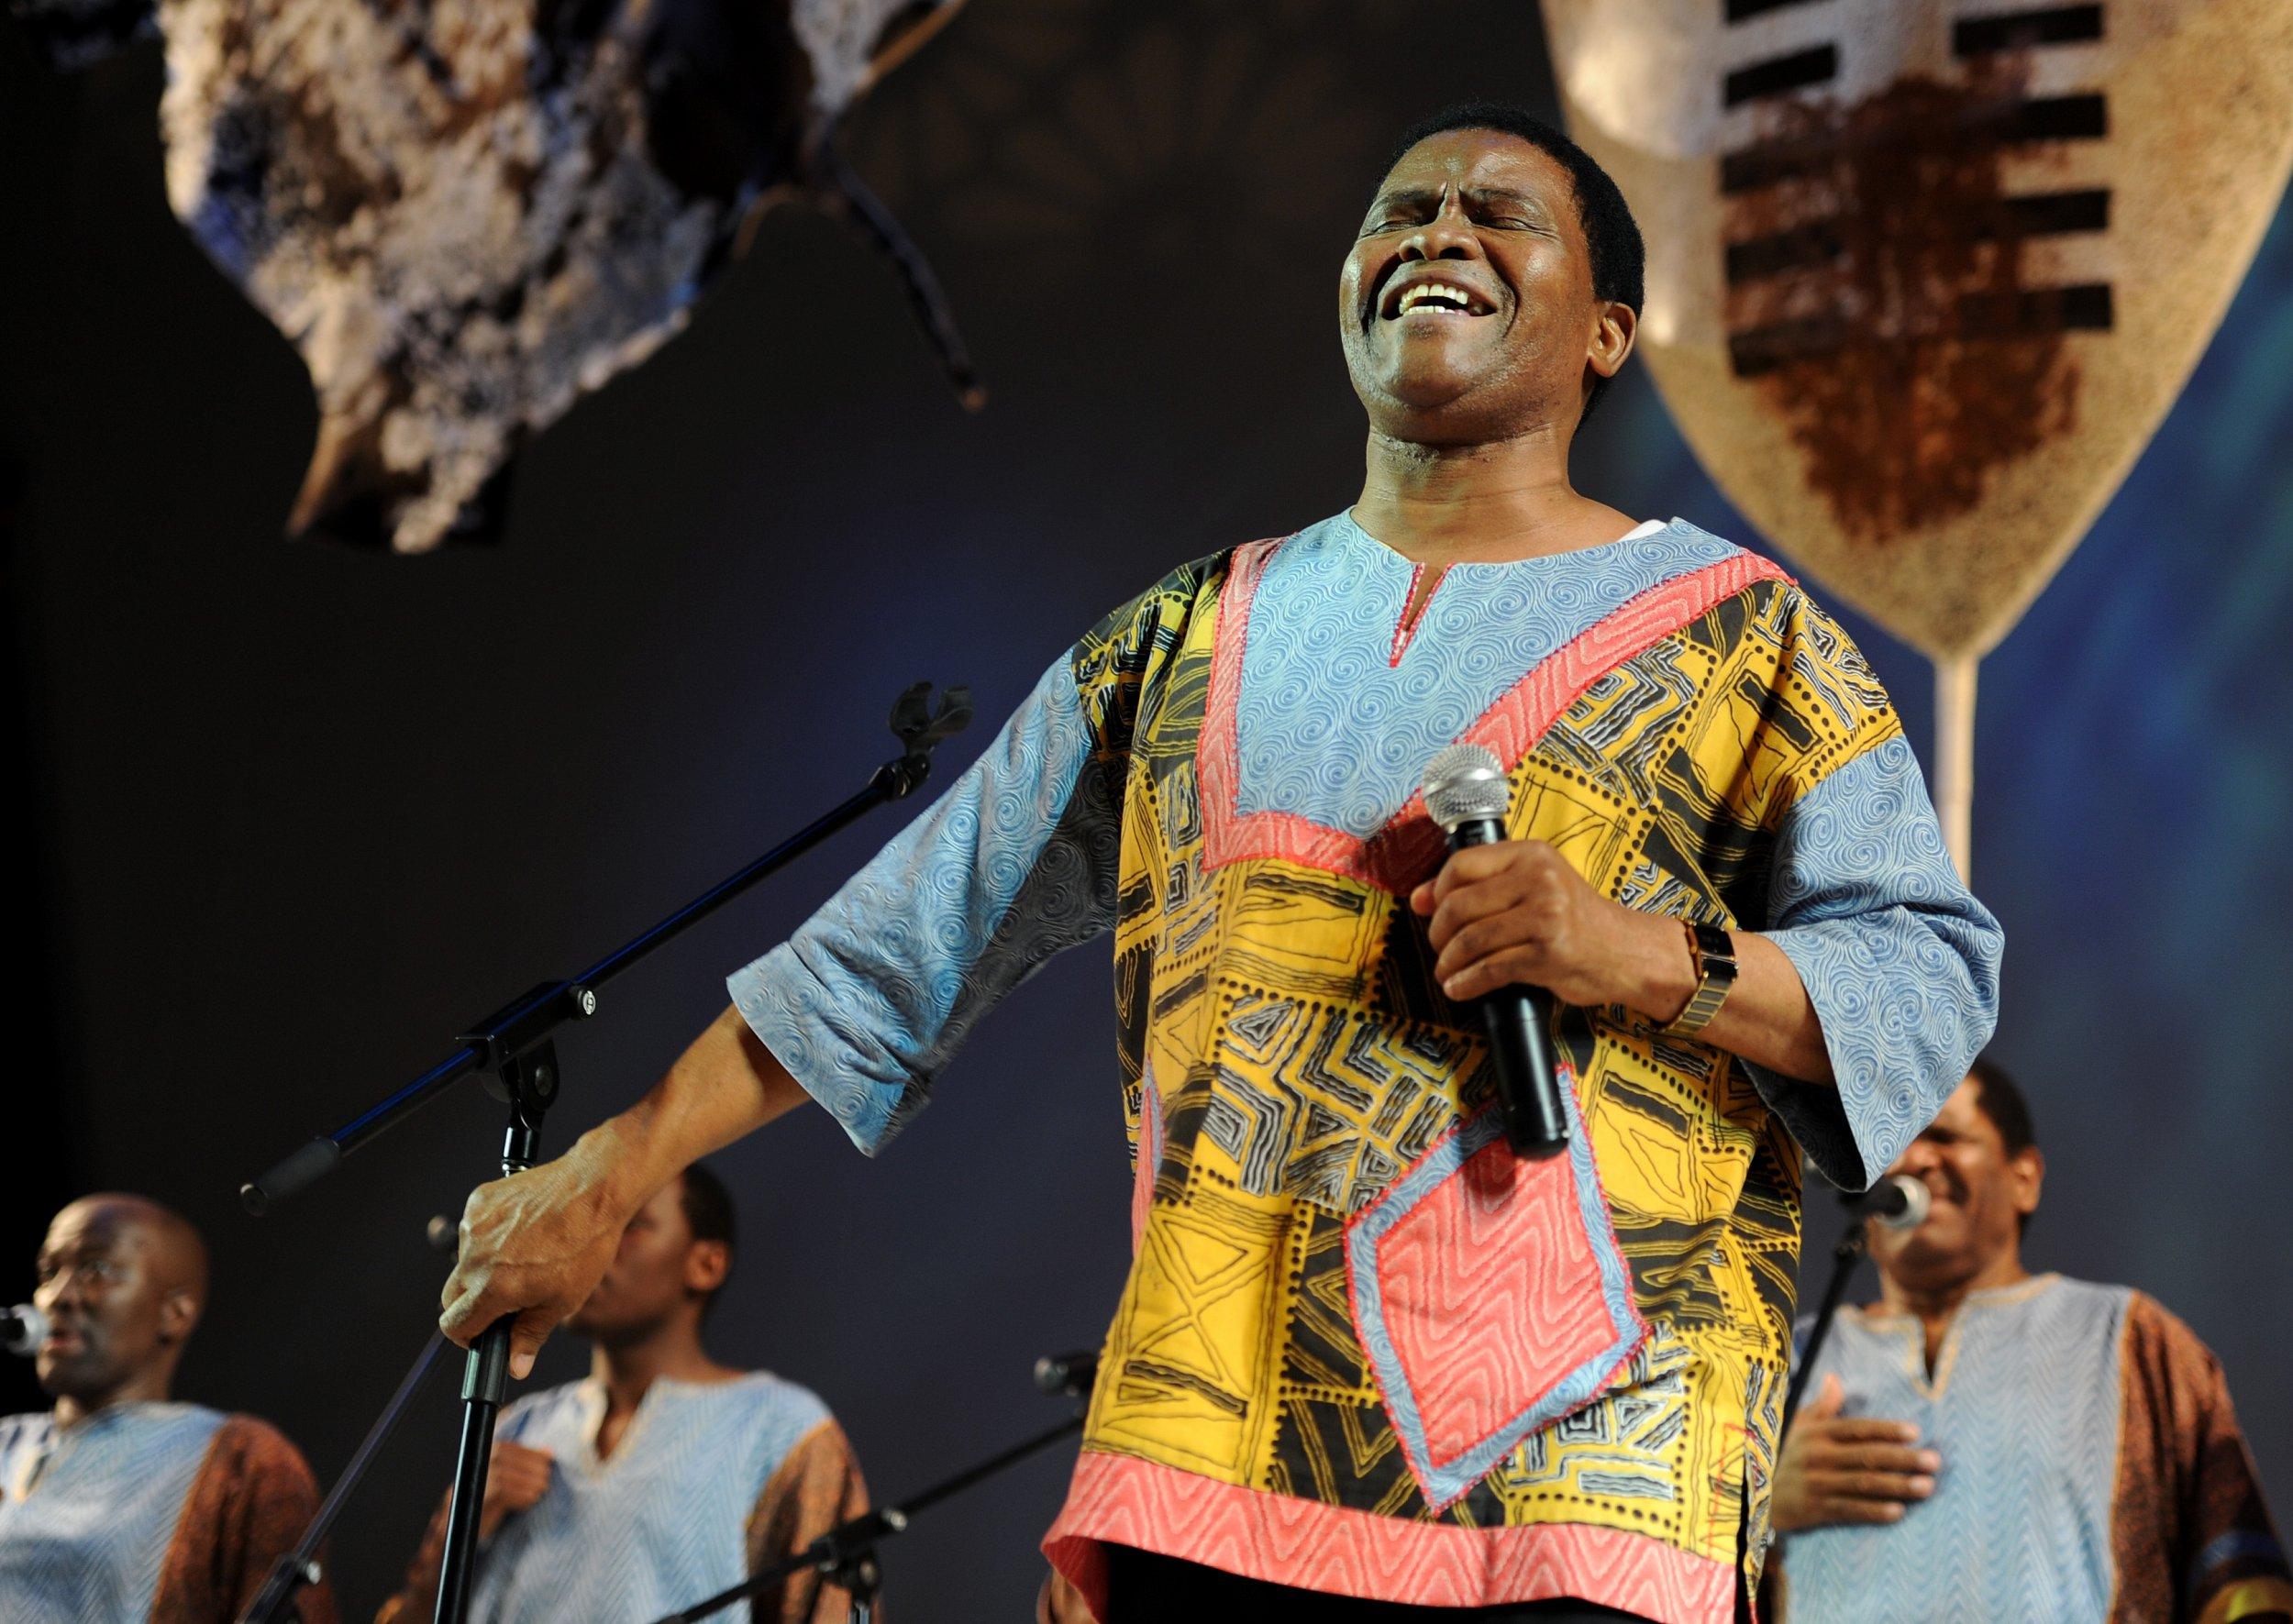 Ladysmith Black Mambazo perform in Durban